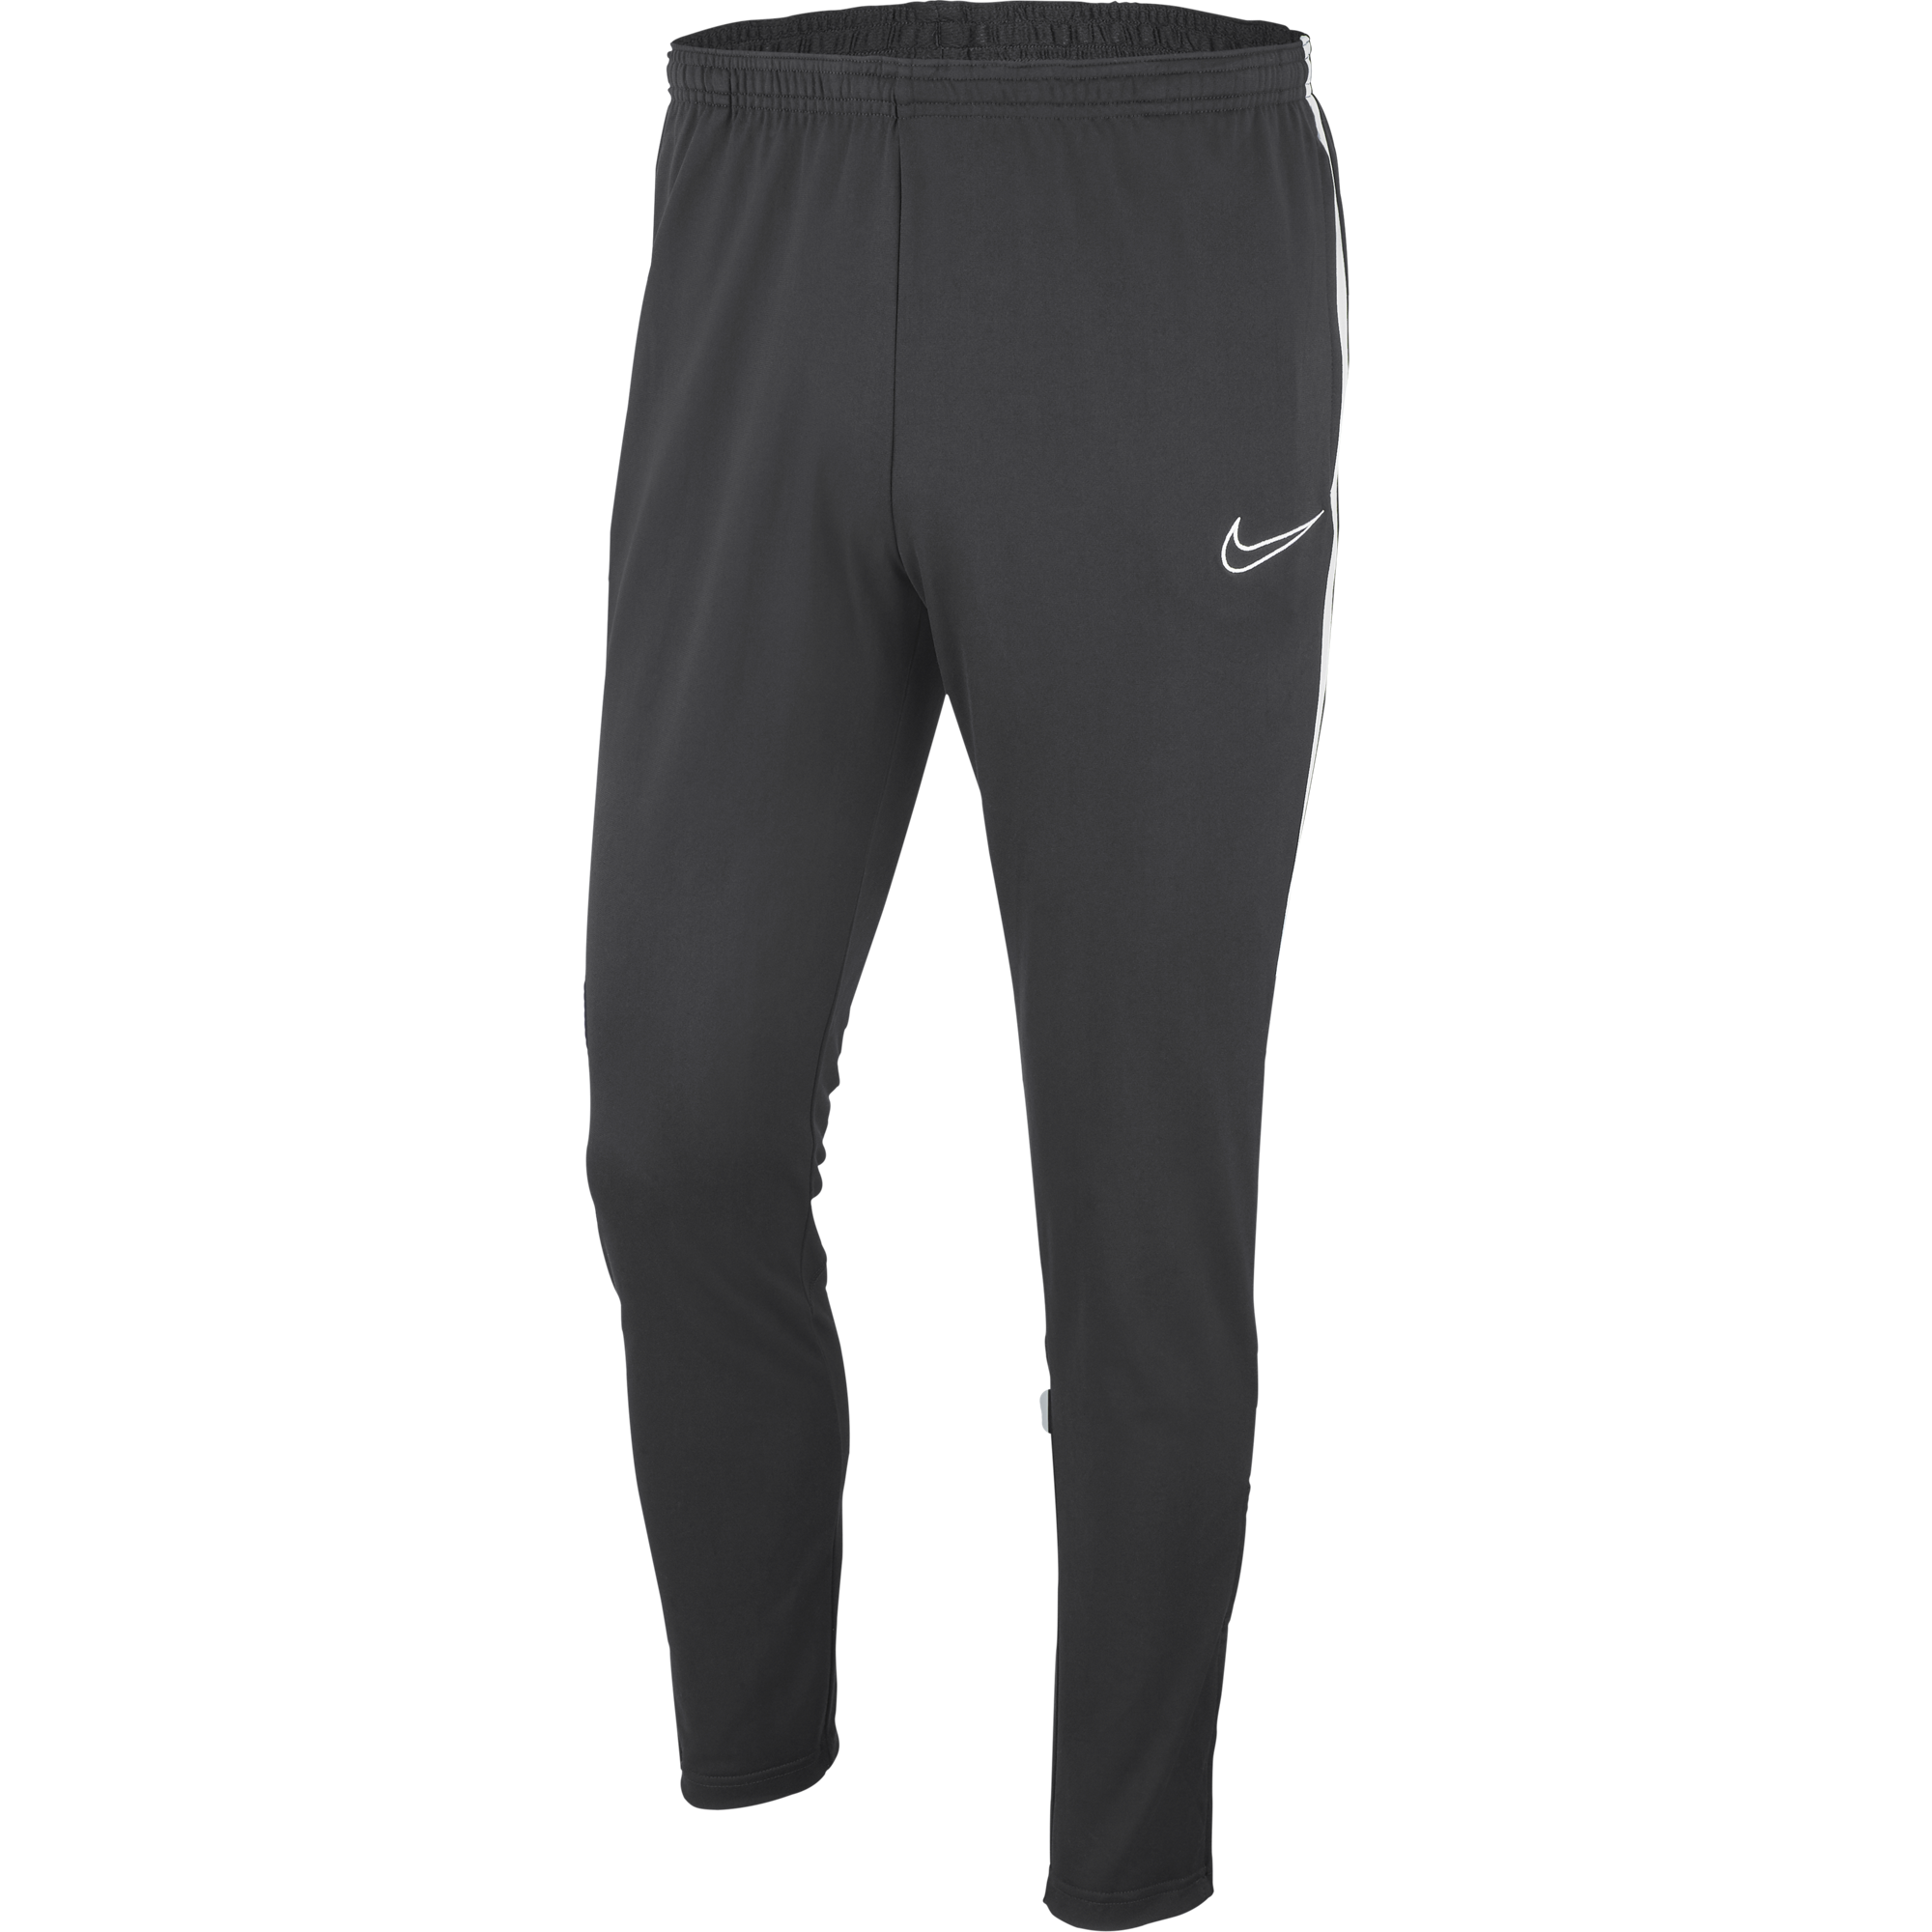 crumlin star academy 19 knitted skinny pant size xl boys 27000 p